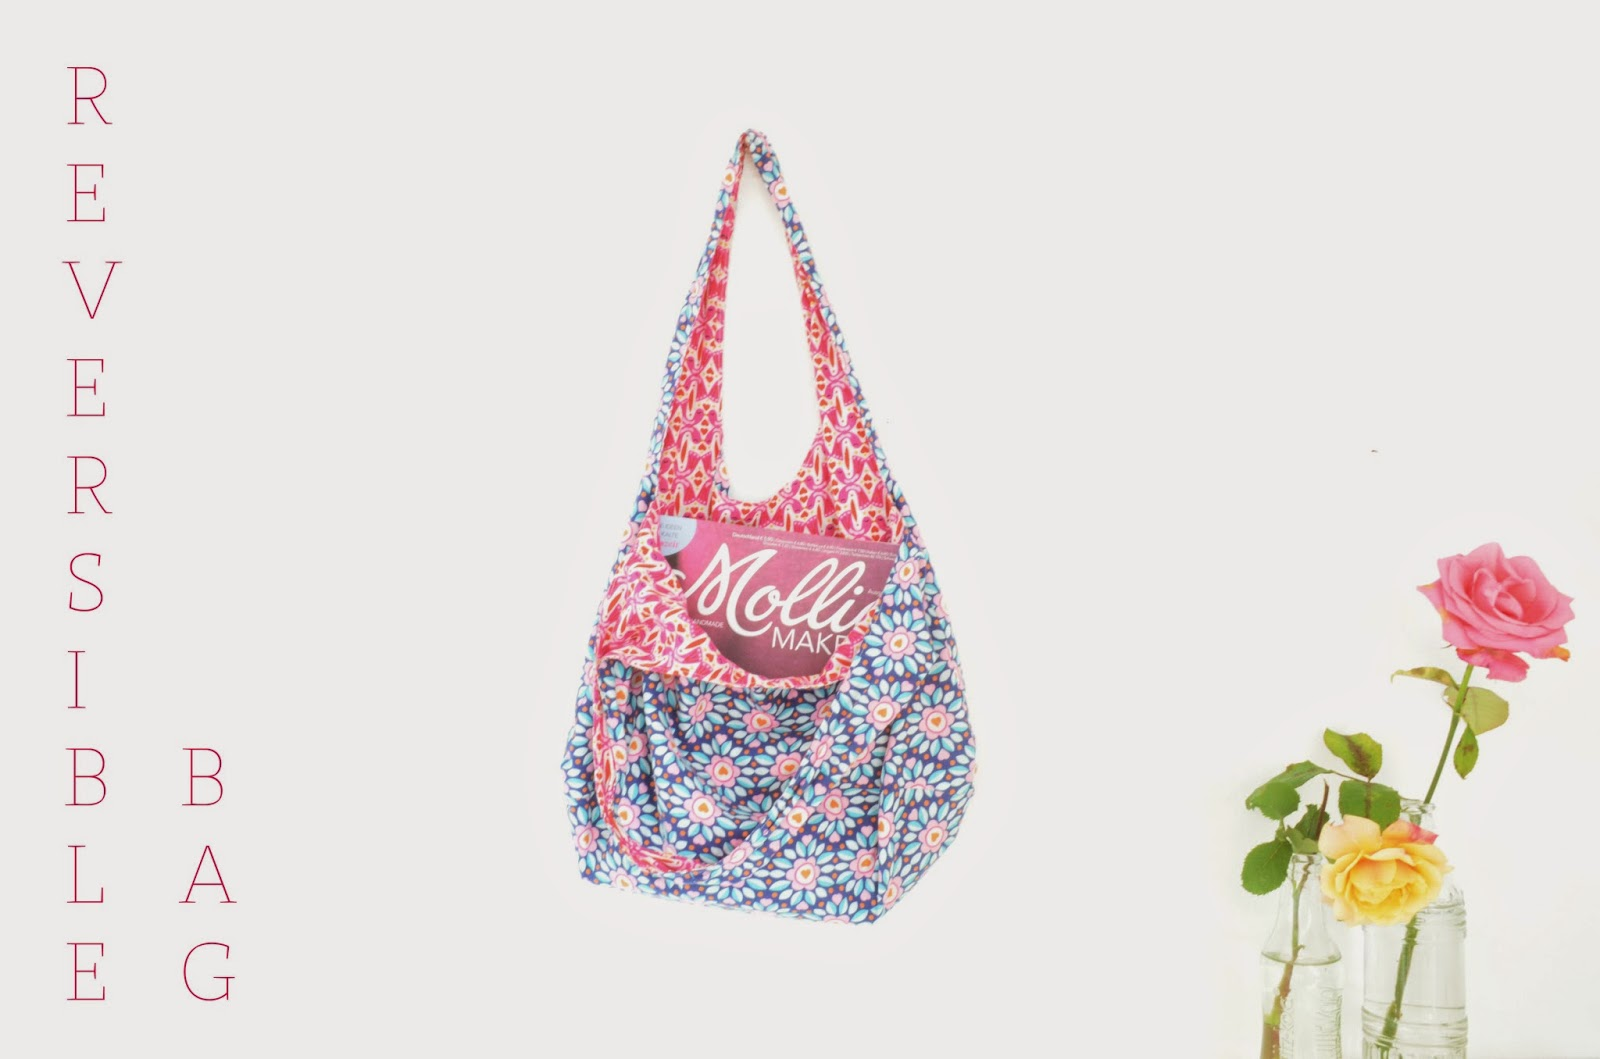 schwesterherz.: Reversible Bag